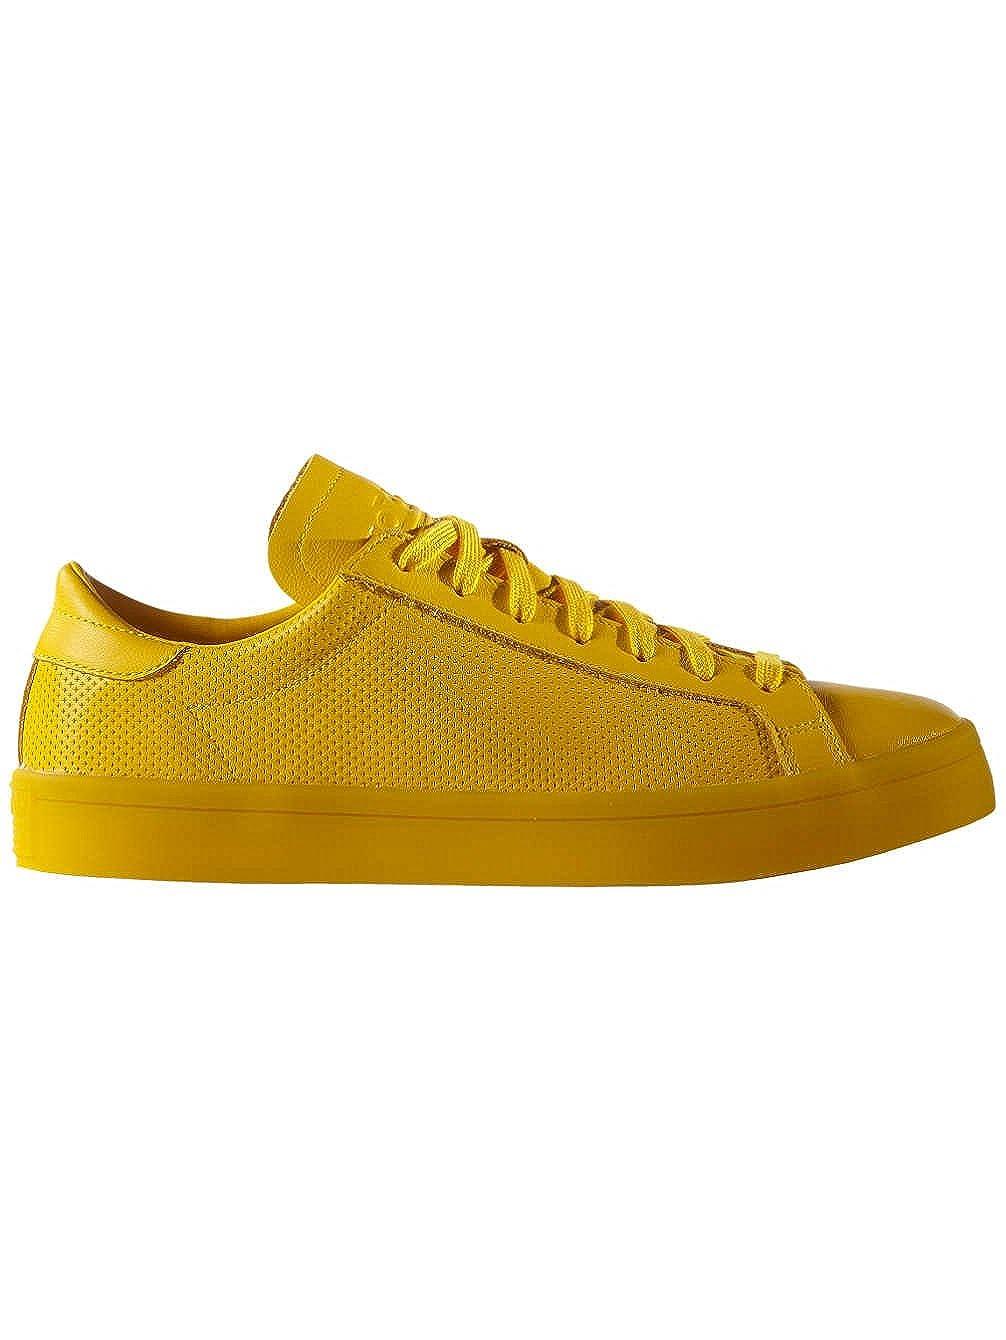 1f592db878 Amazon.com | adidas Originals Courtvantage Adicolor Mens Trainers Sneakers  | Track & Field & Cross Country